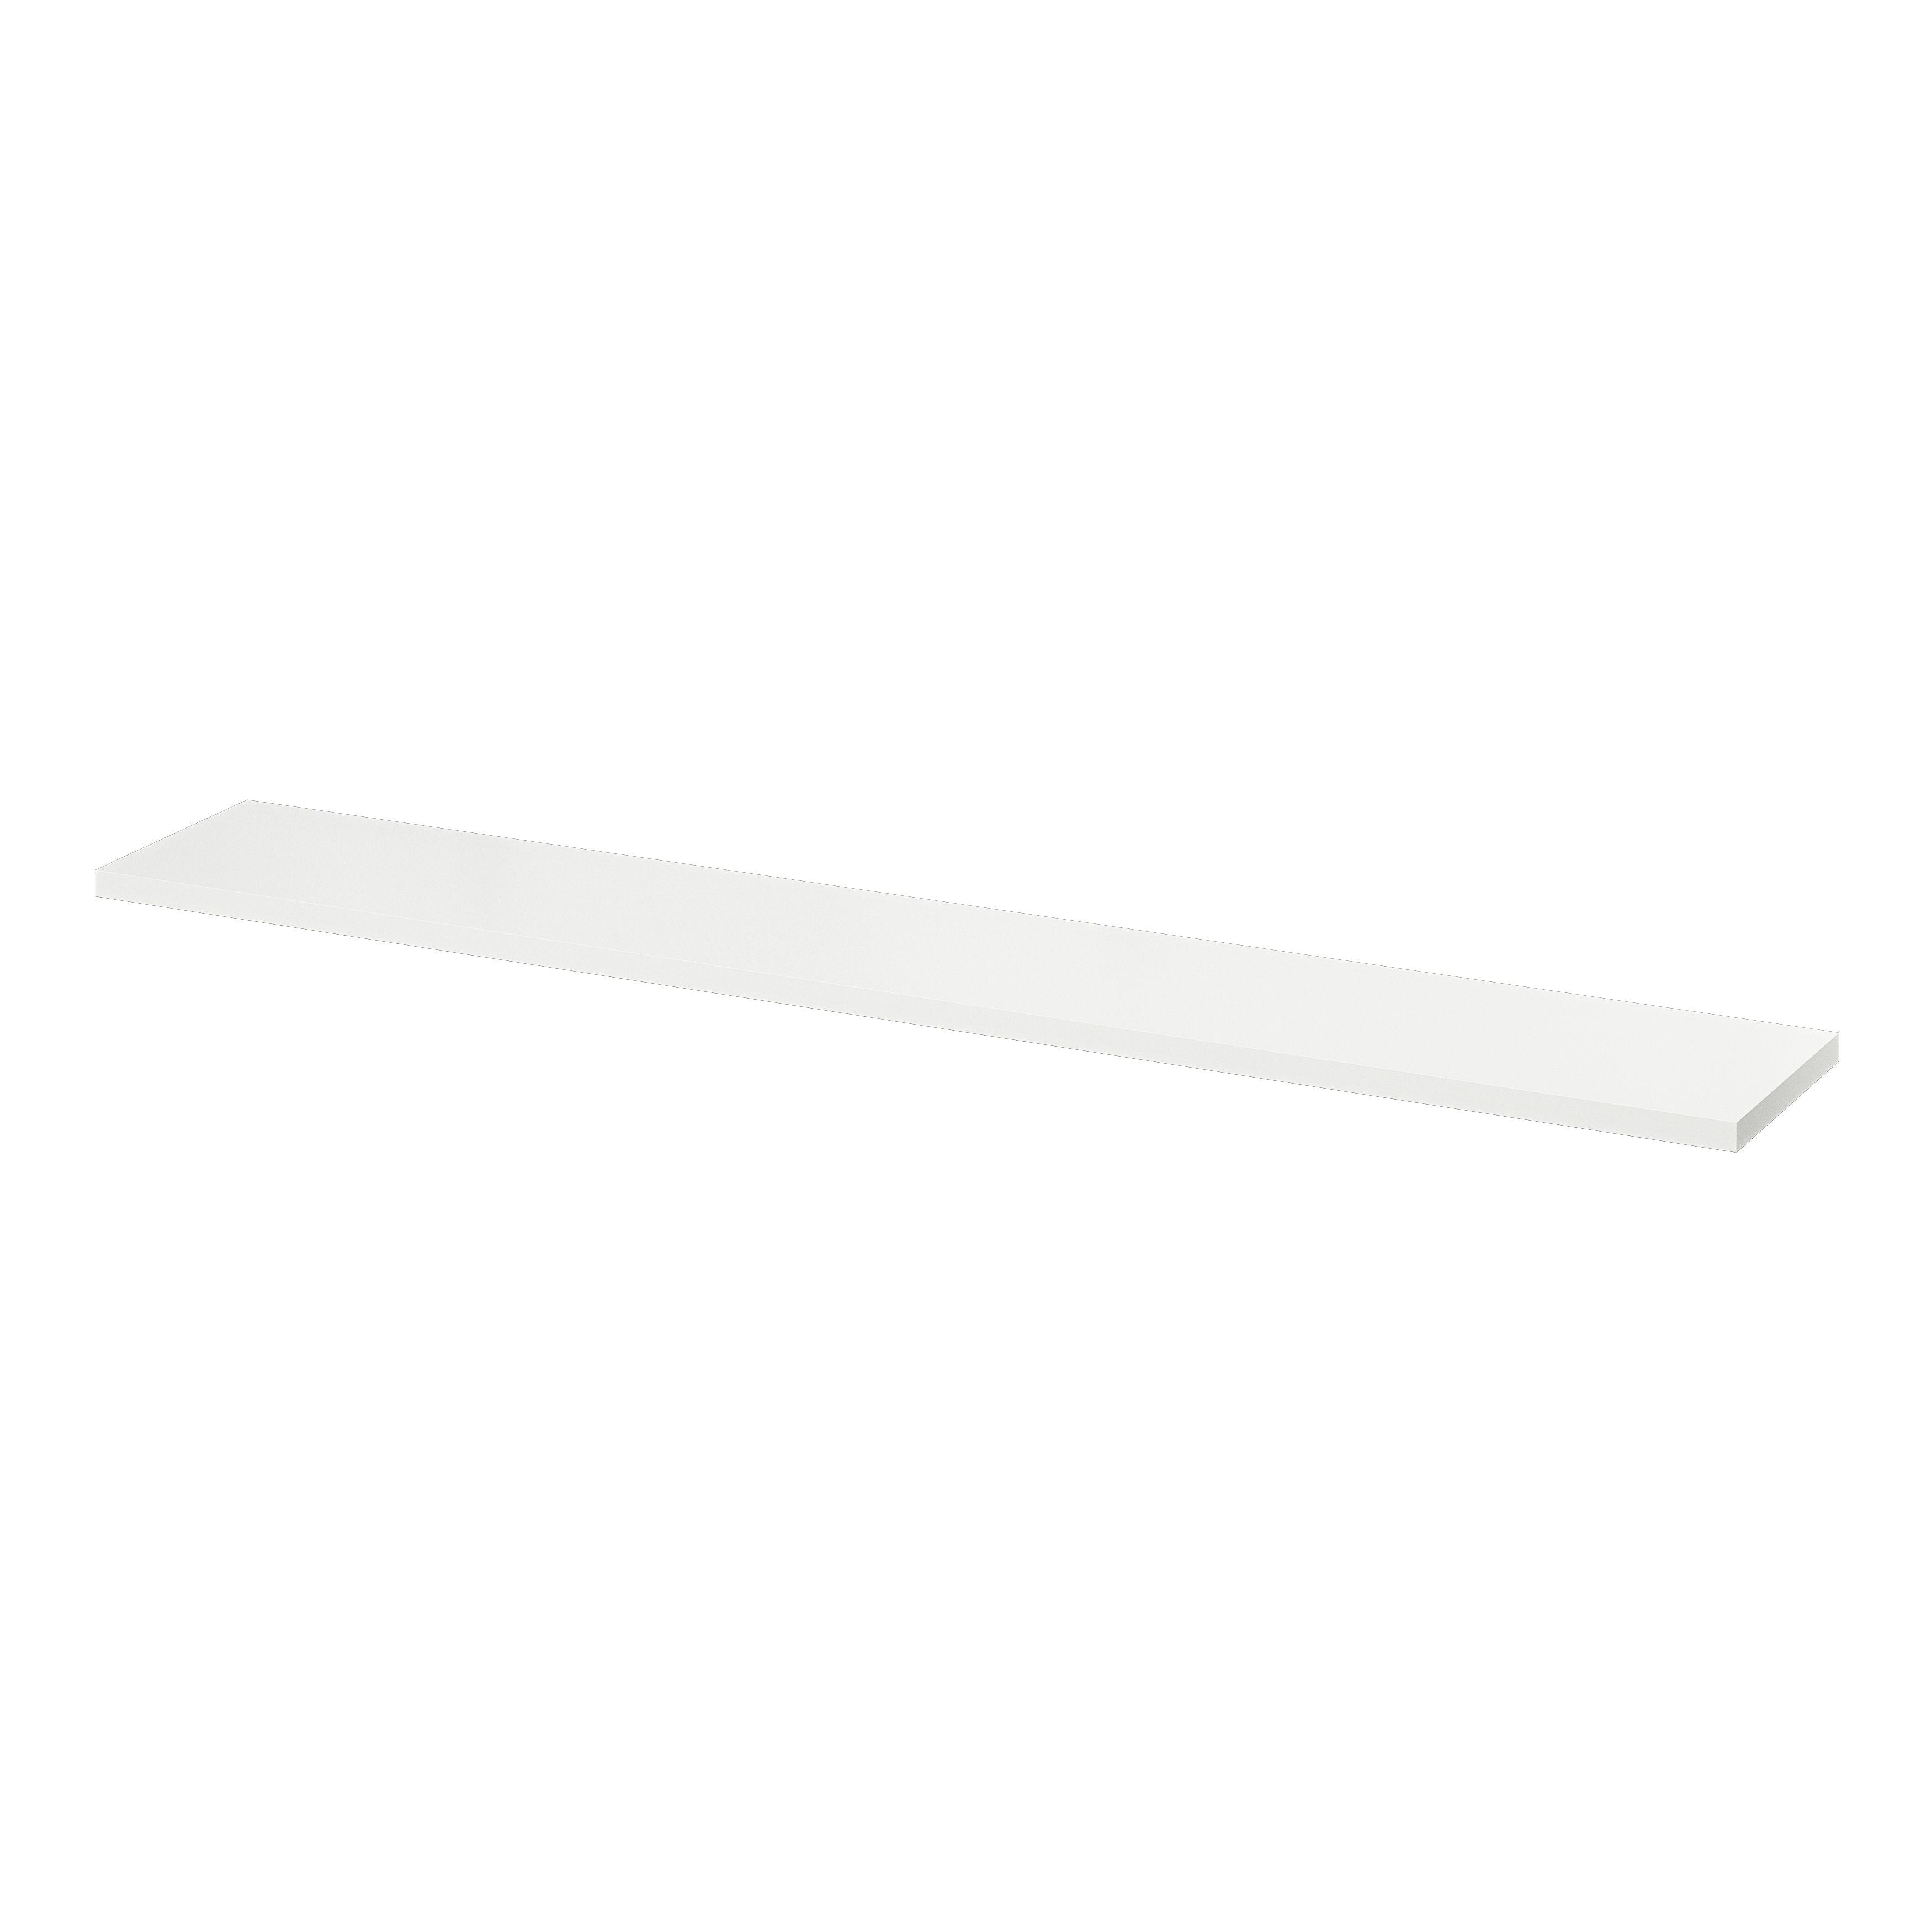 Rigga White Wall Shelf (L)1180Mm (D)190Mm